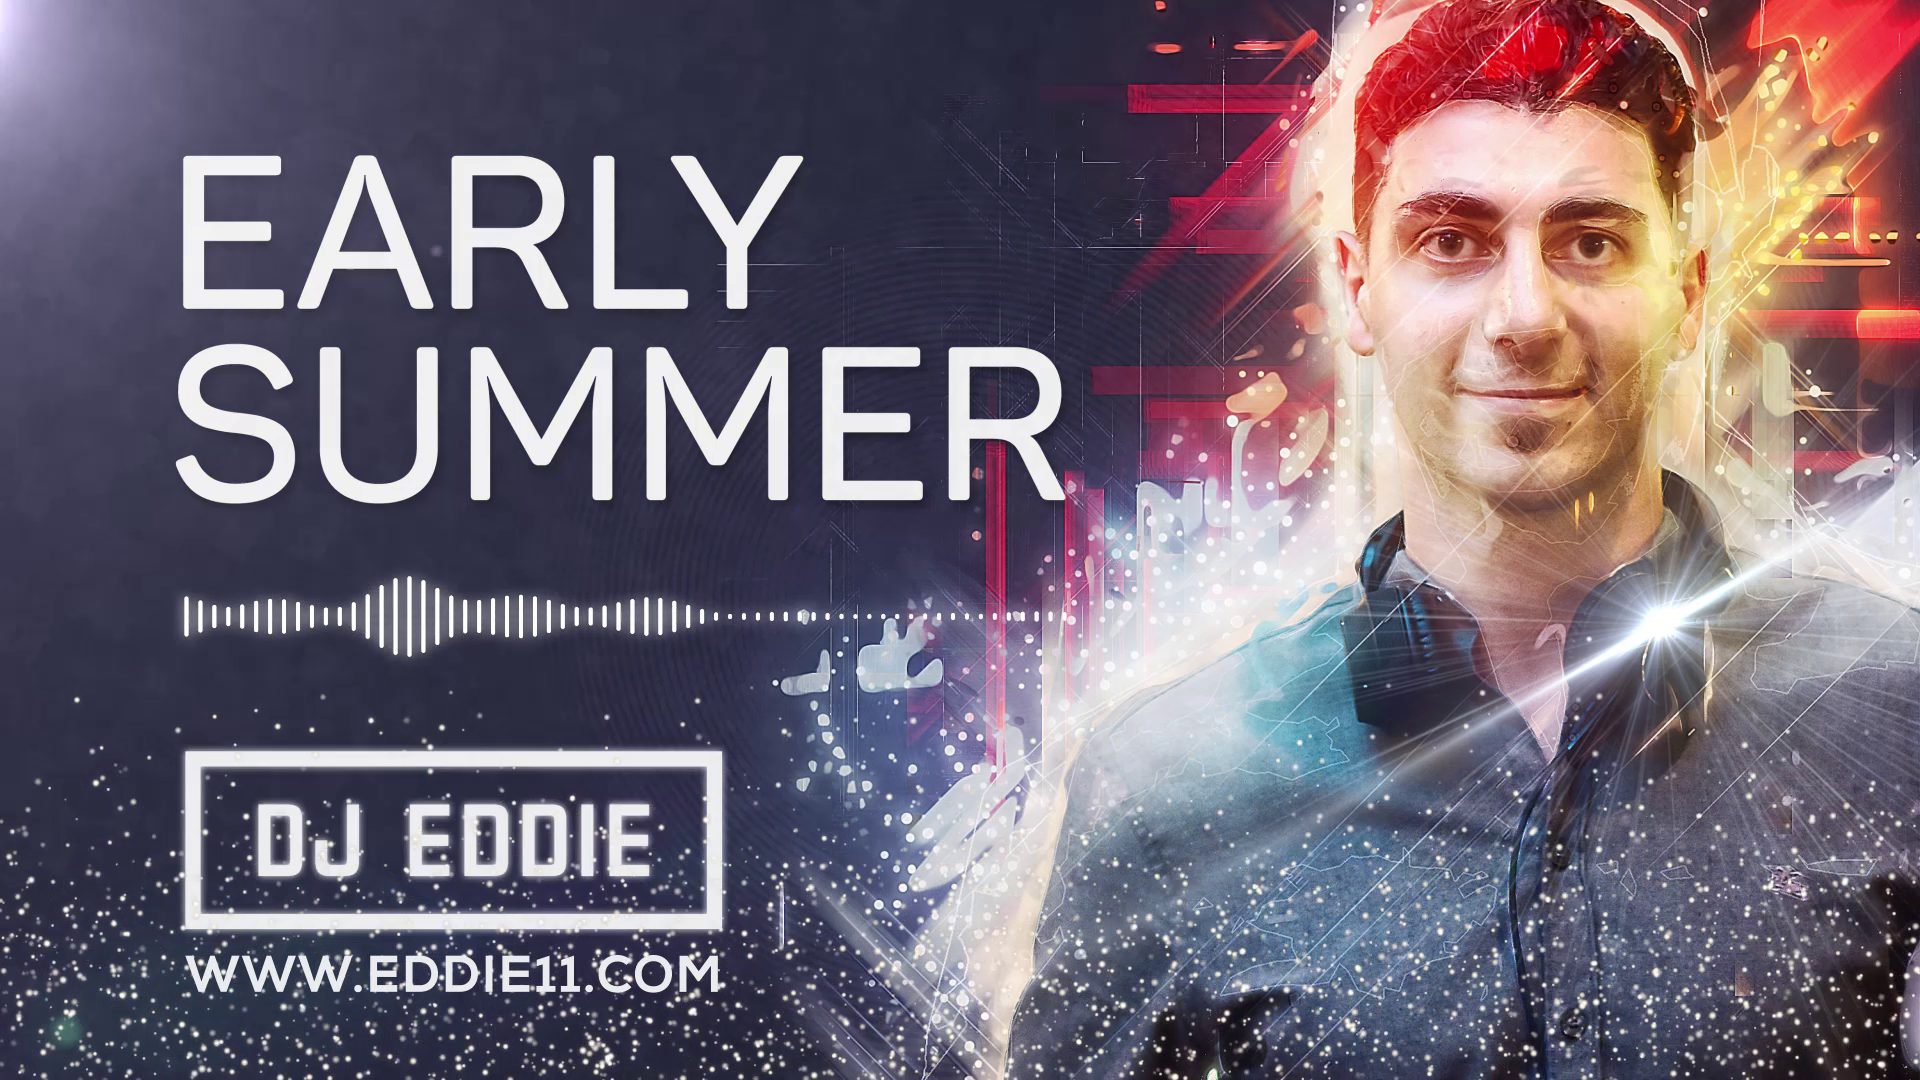 Early Summer Live Mix - DJ Eddie